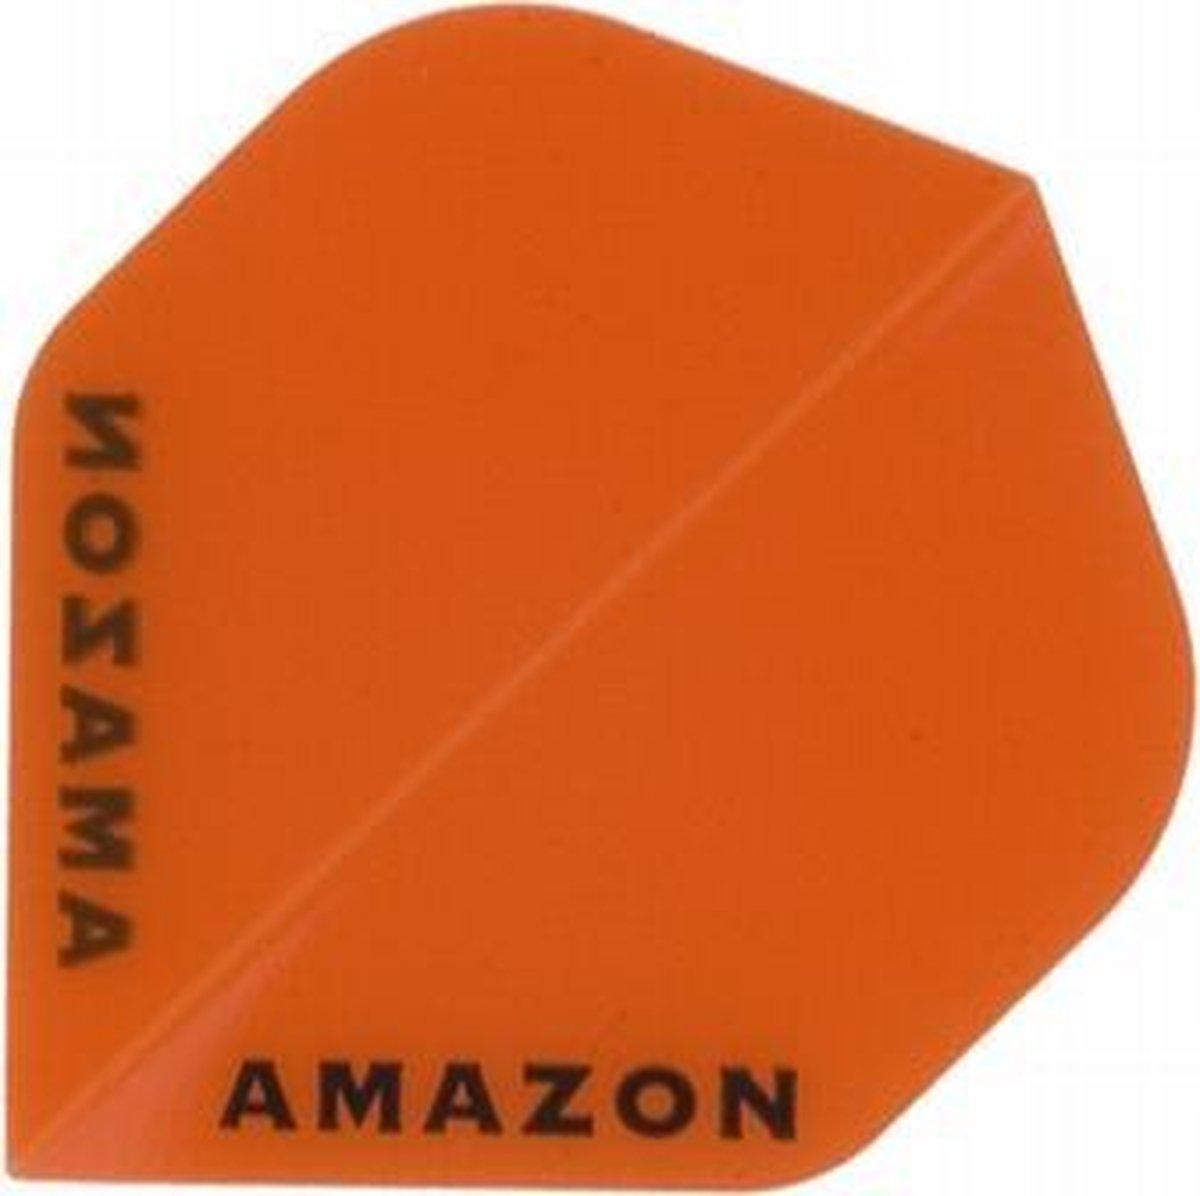 5 sets (15 stuks) Ruthless flights Amazon Transparant Std Orange